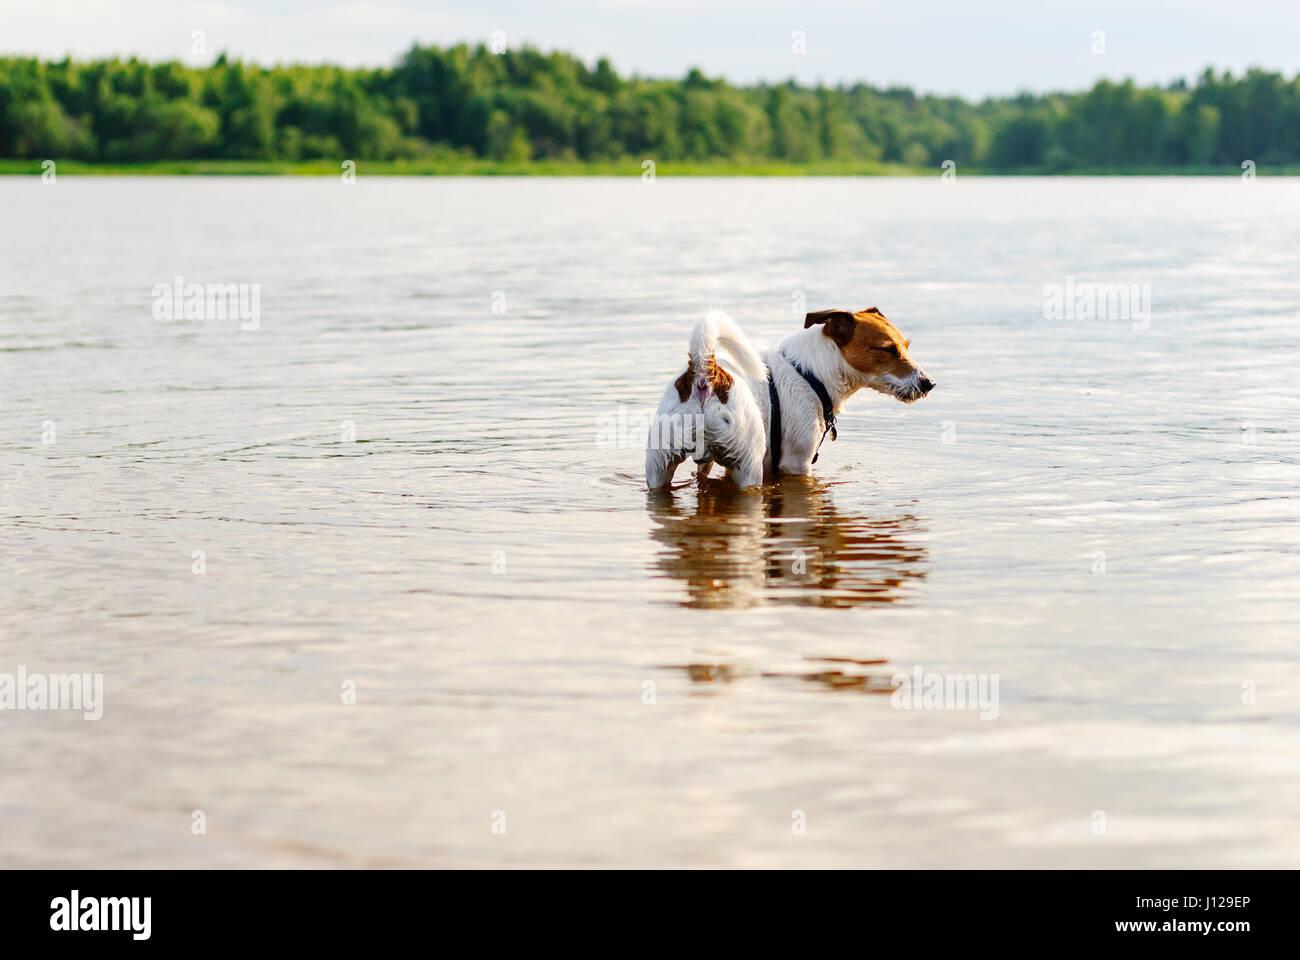 Dog rambling in river water at hot summer day - Stock Image